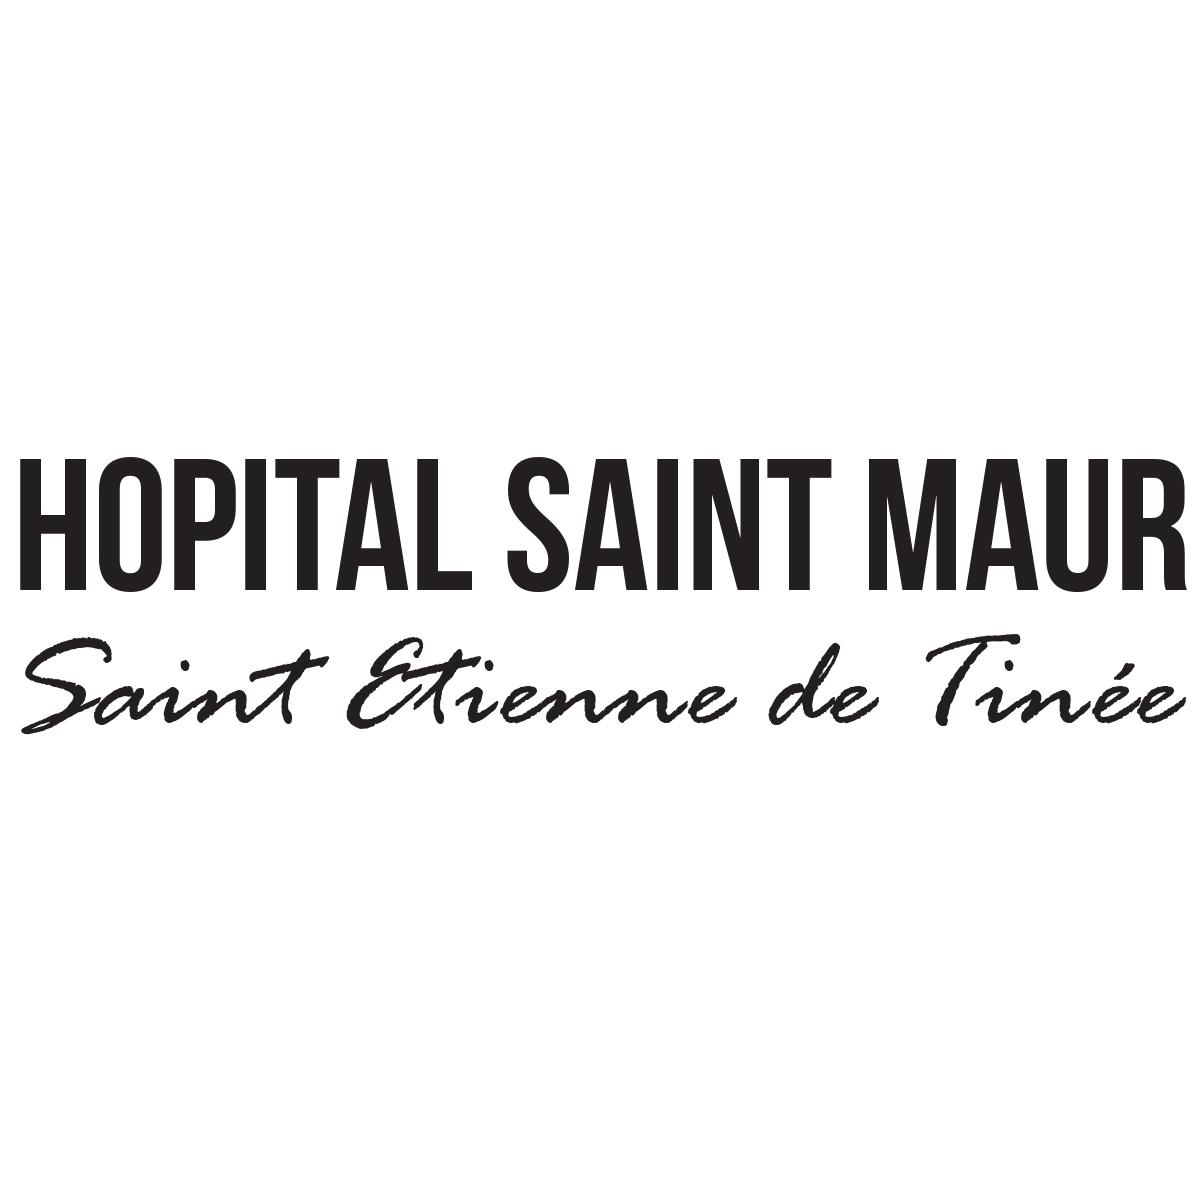 Hôpital St Maur